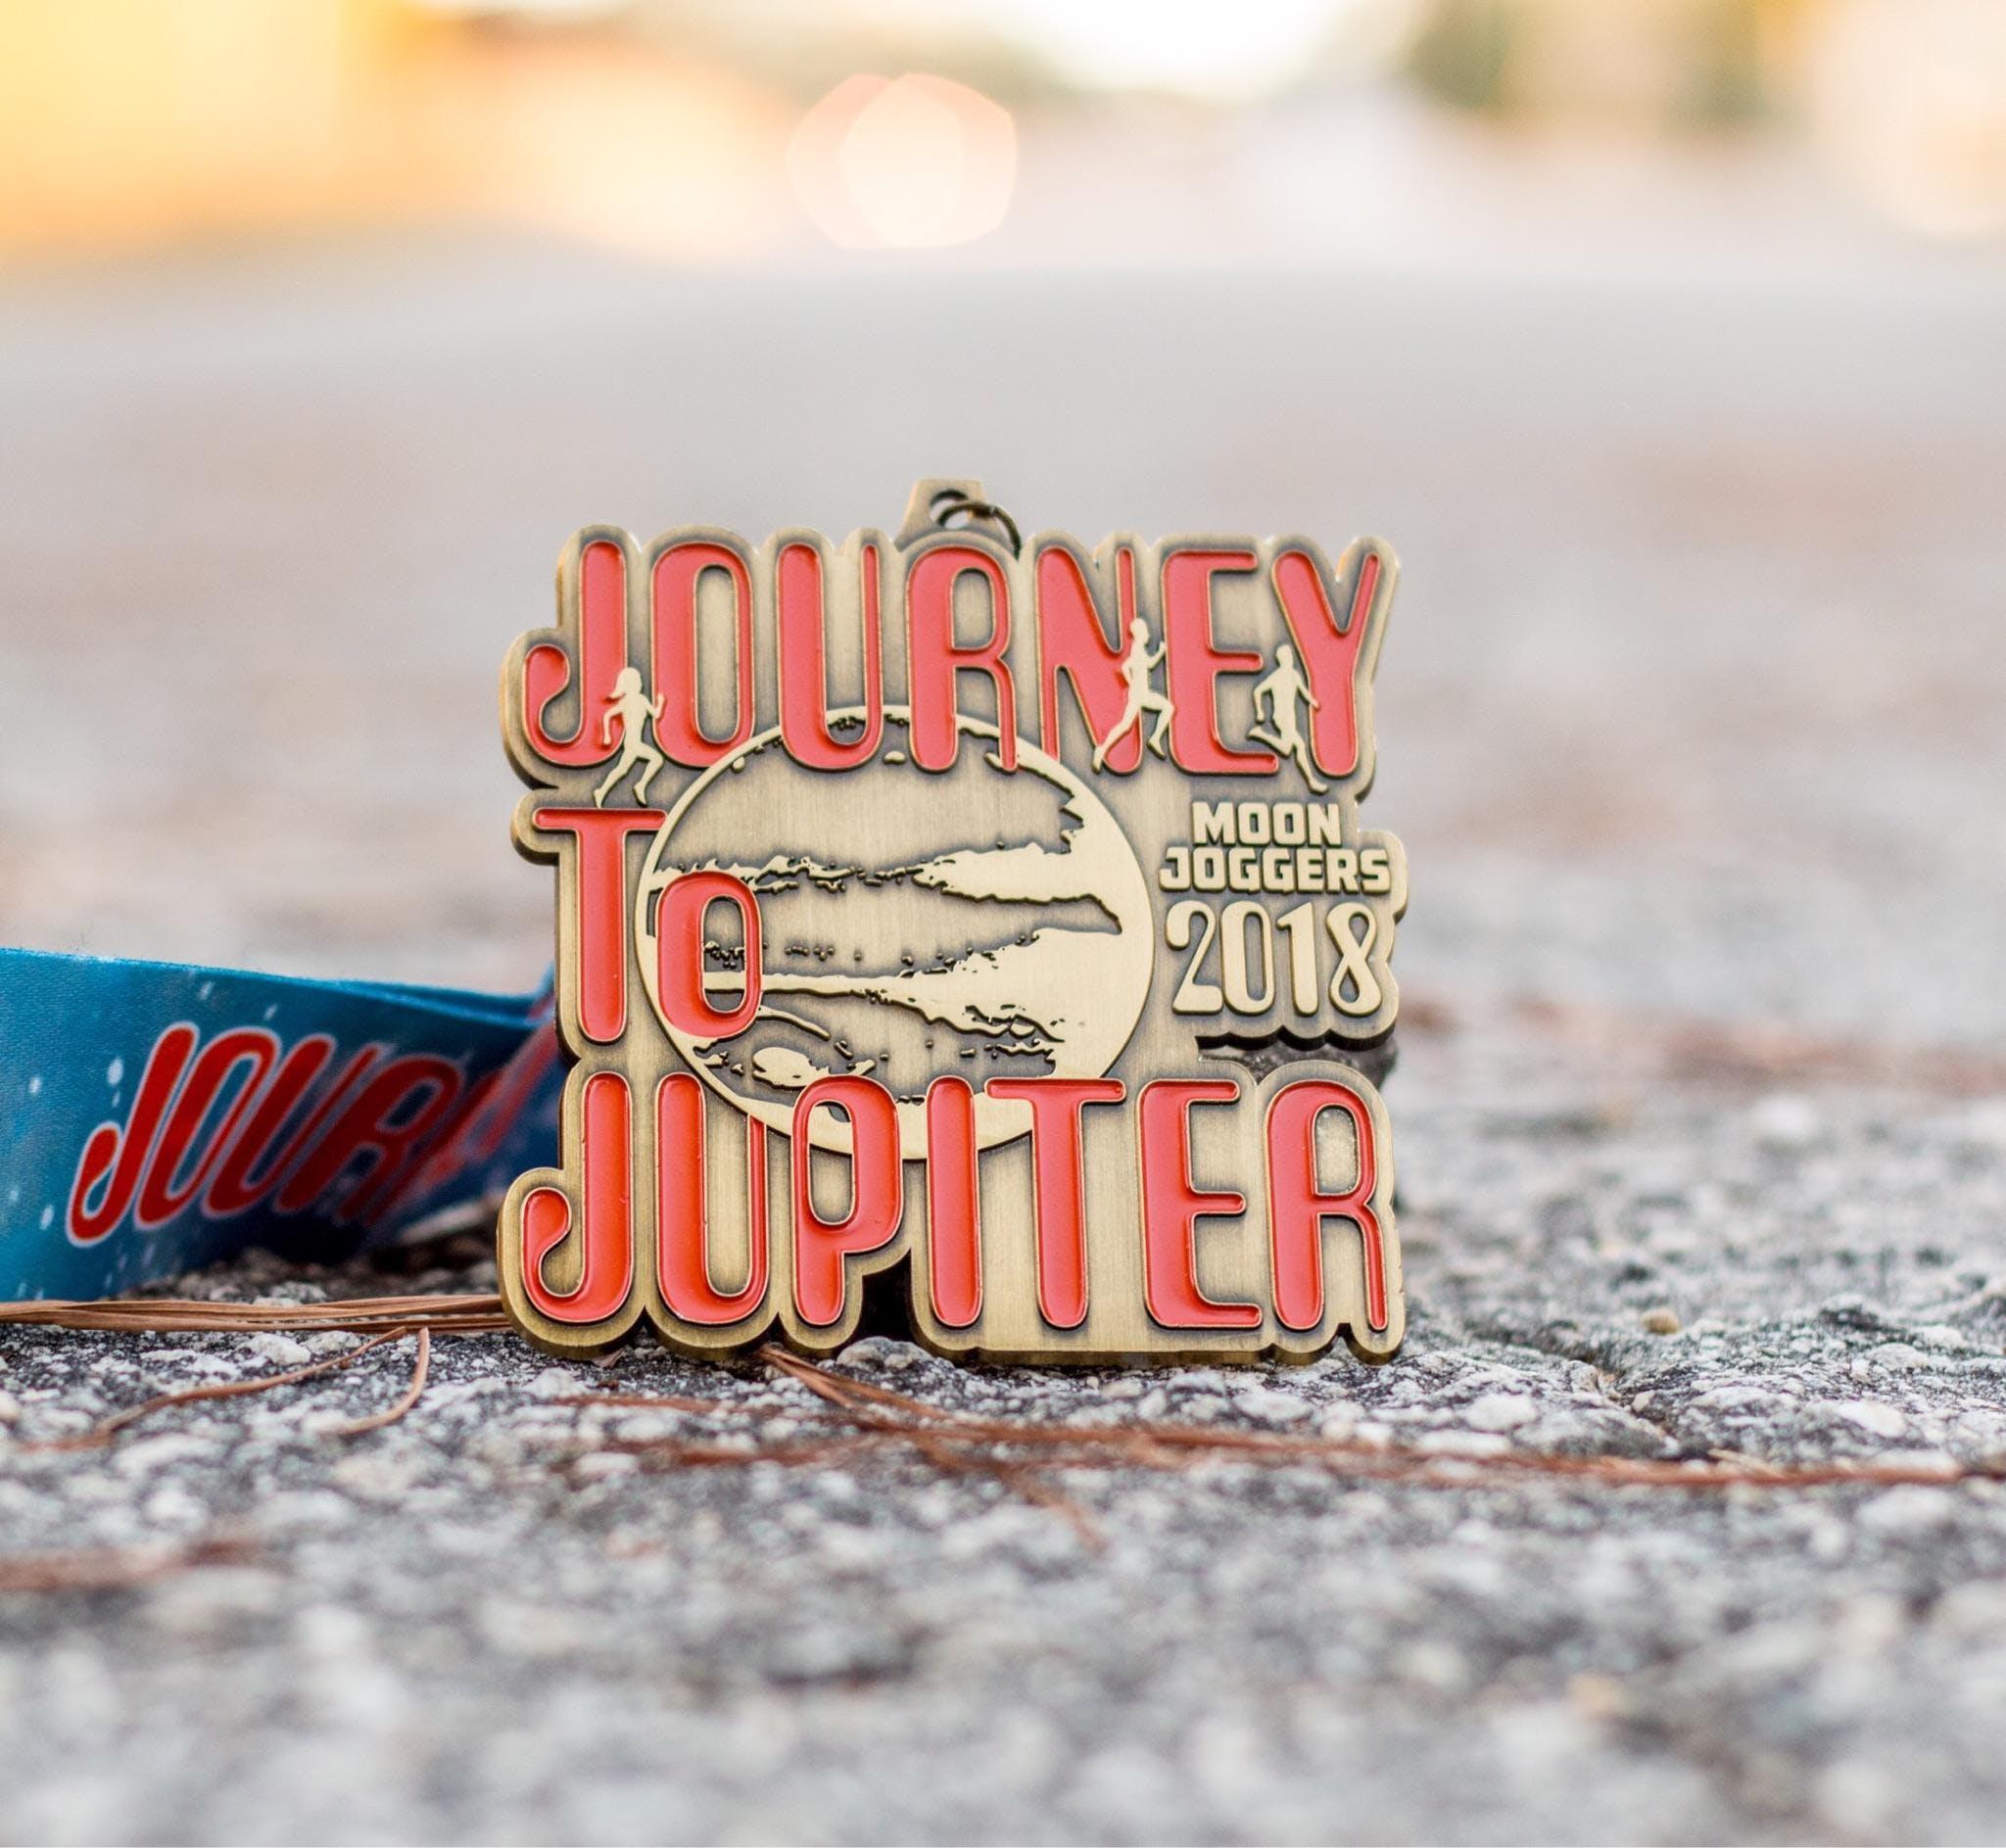 Only $12! Journey to Jupiter Running & Walking Challenge -Scottsdale